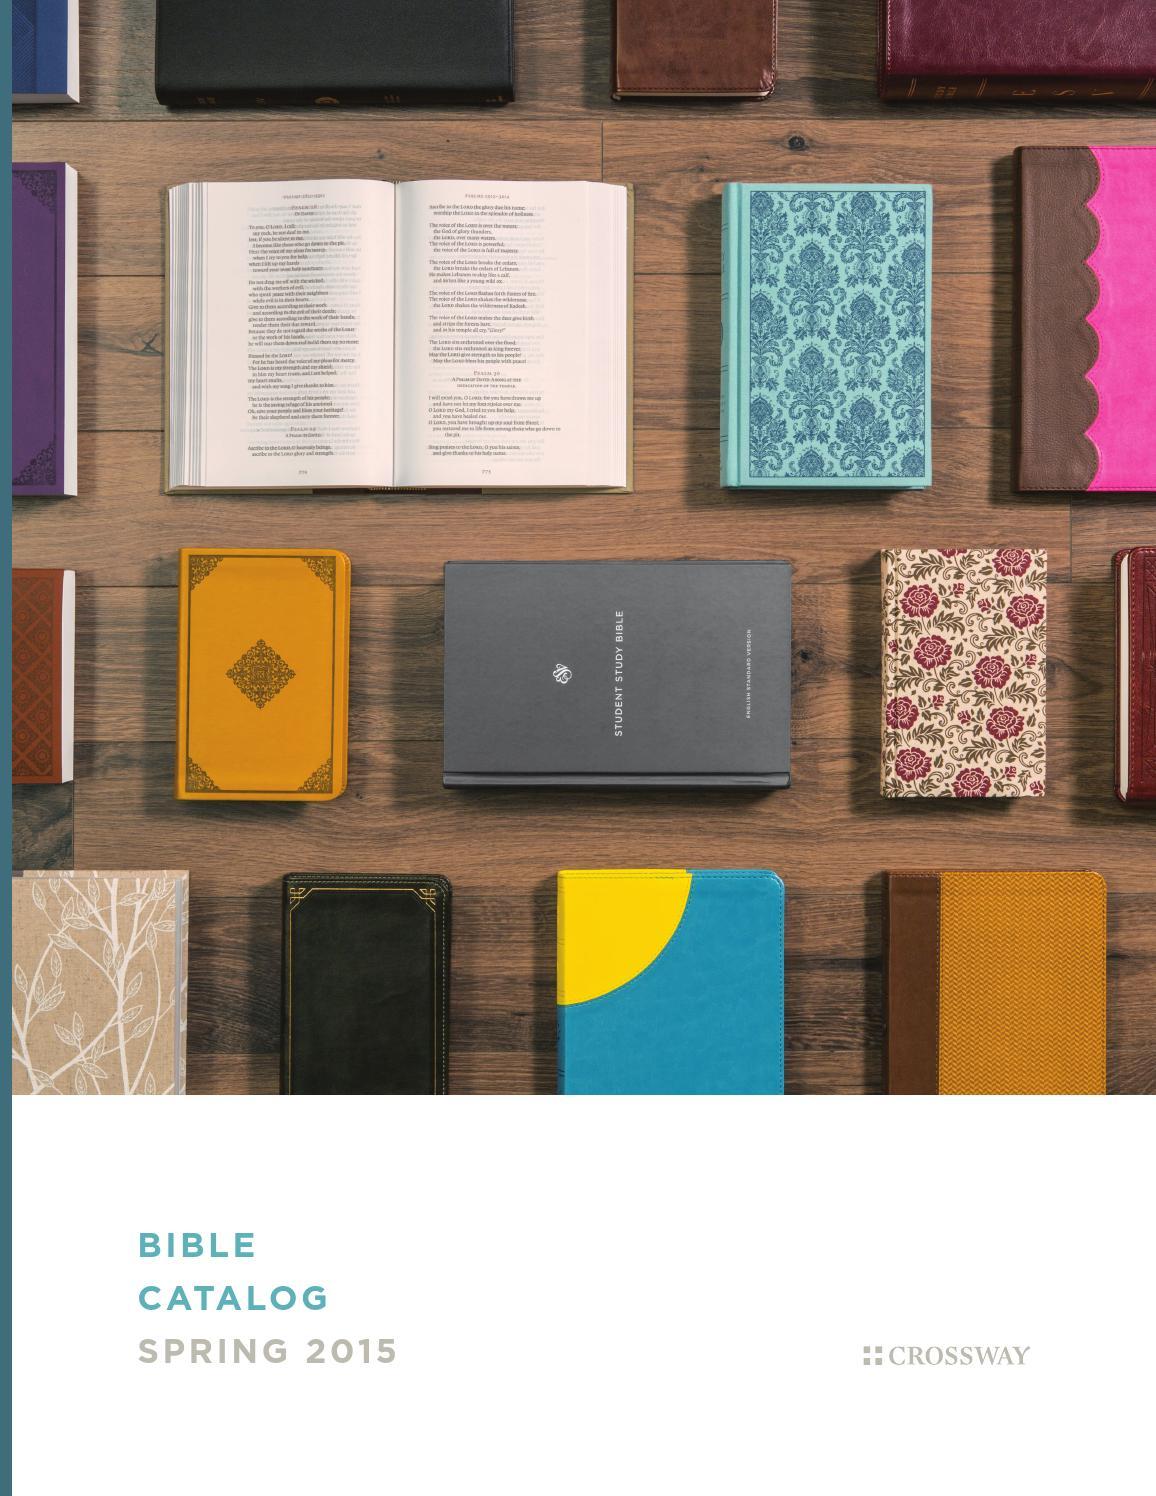 ESV Spring 2015 Bible Catalog by Crossway - issuu